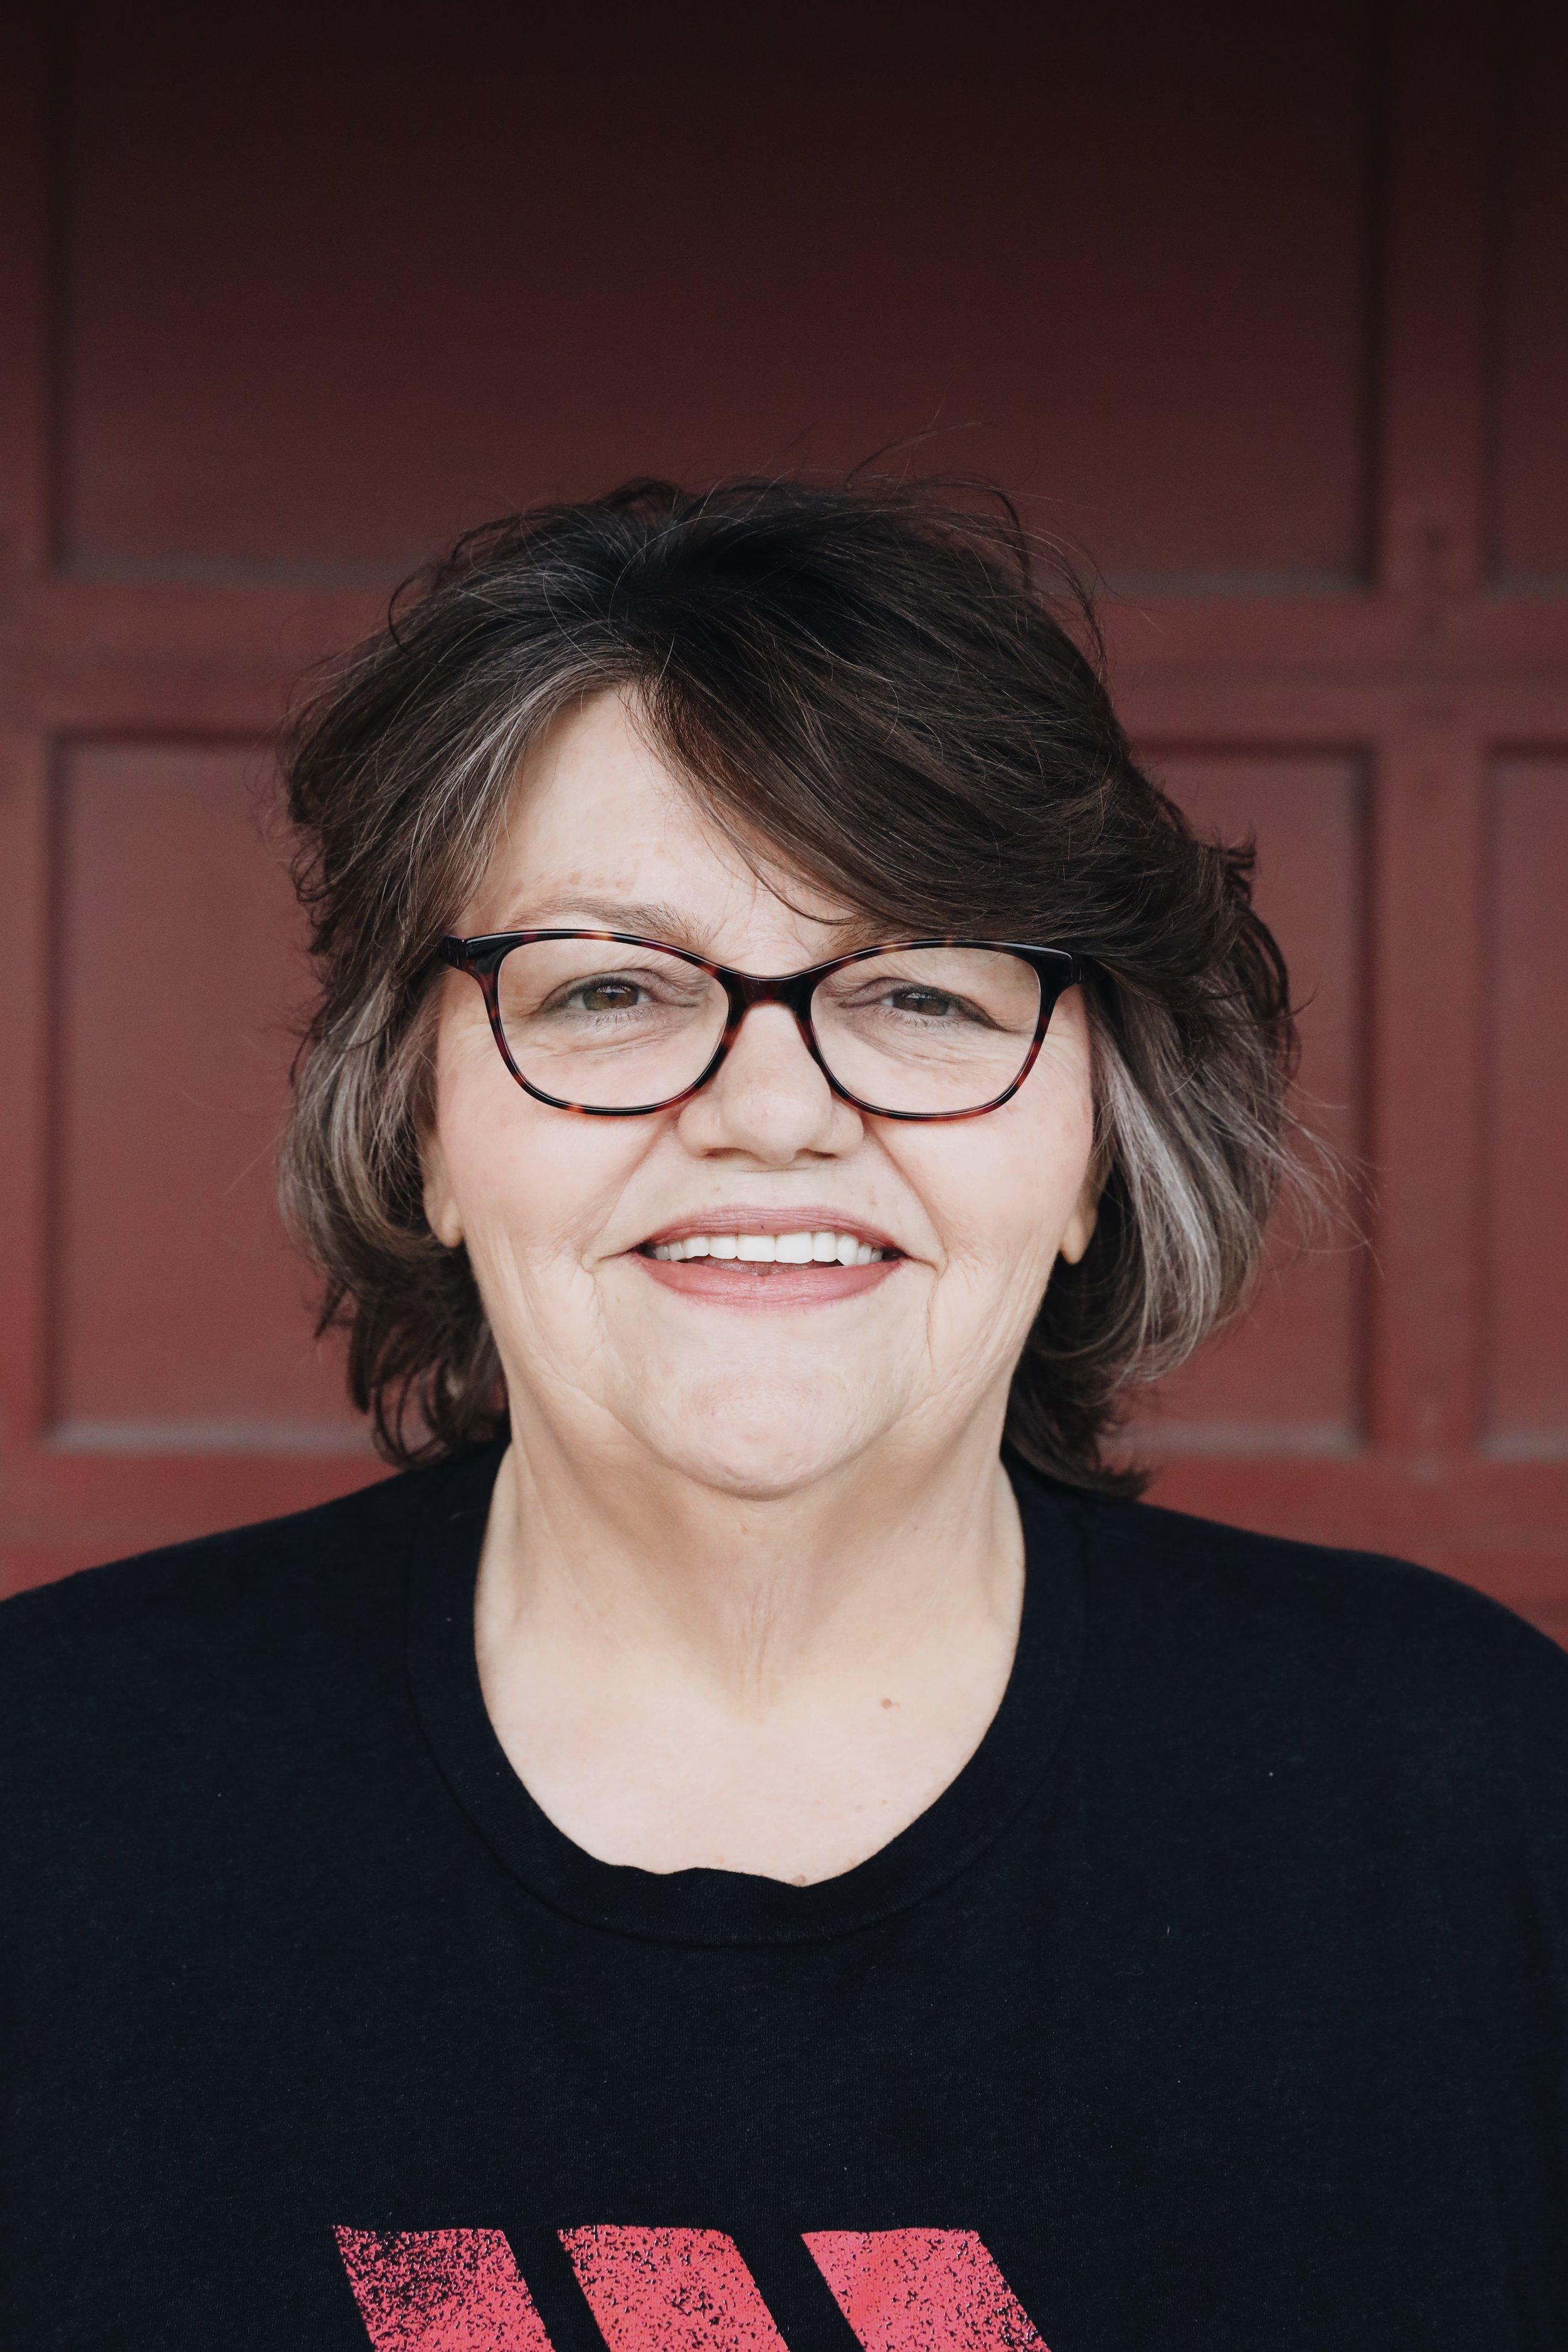 Diana Jones - AR Department Manager